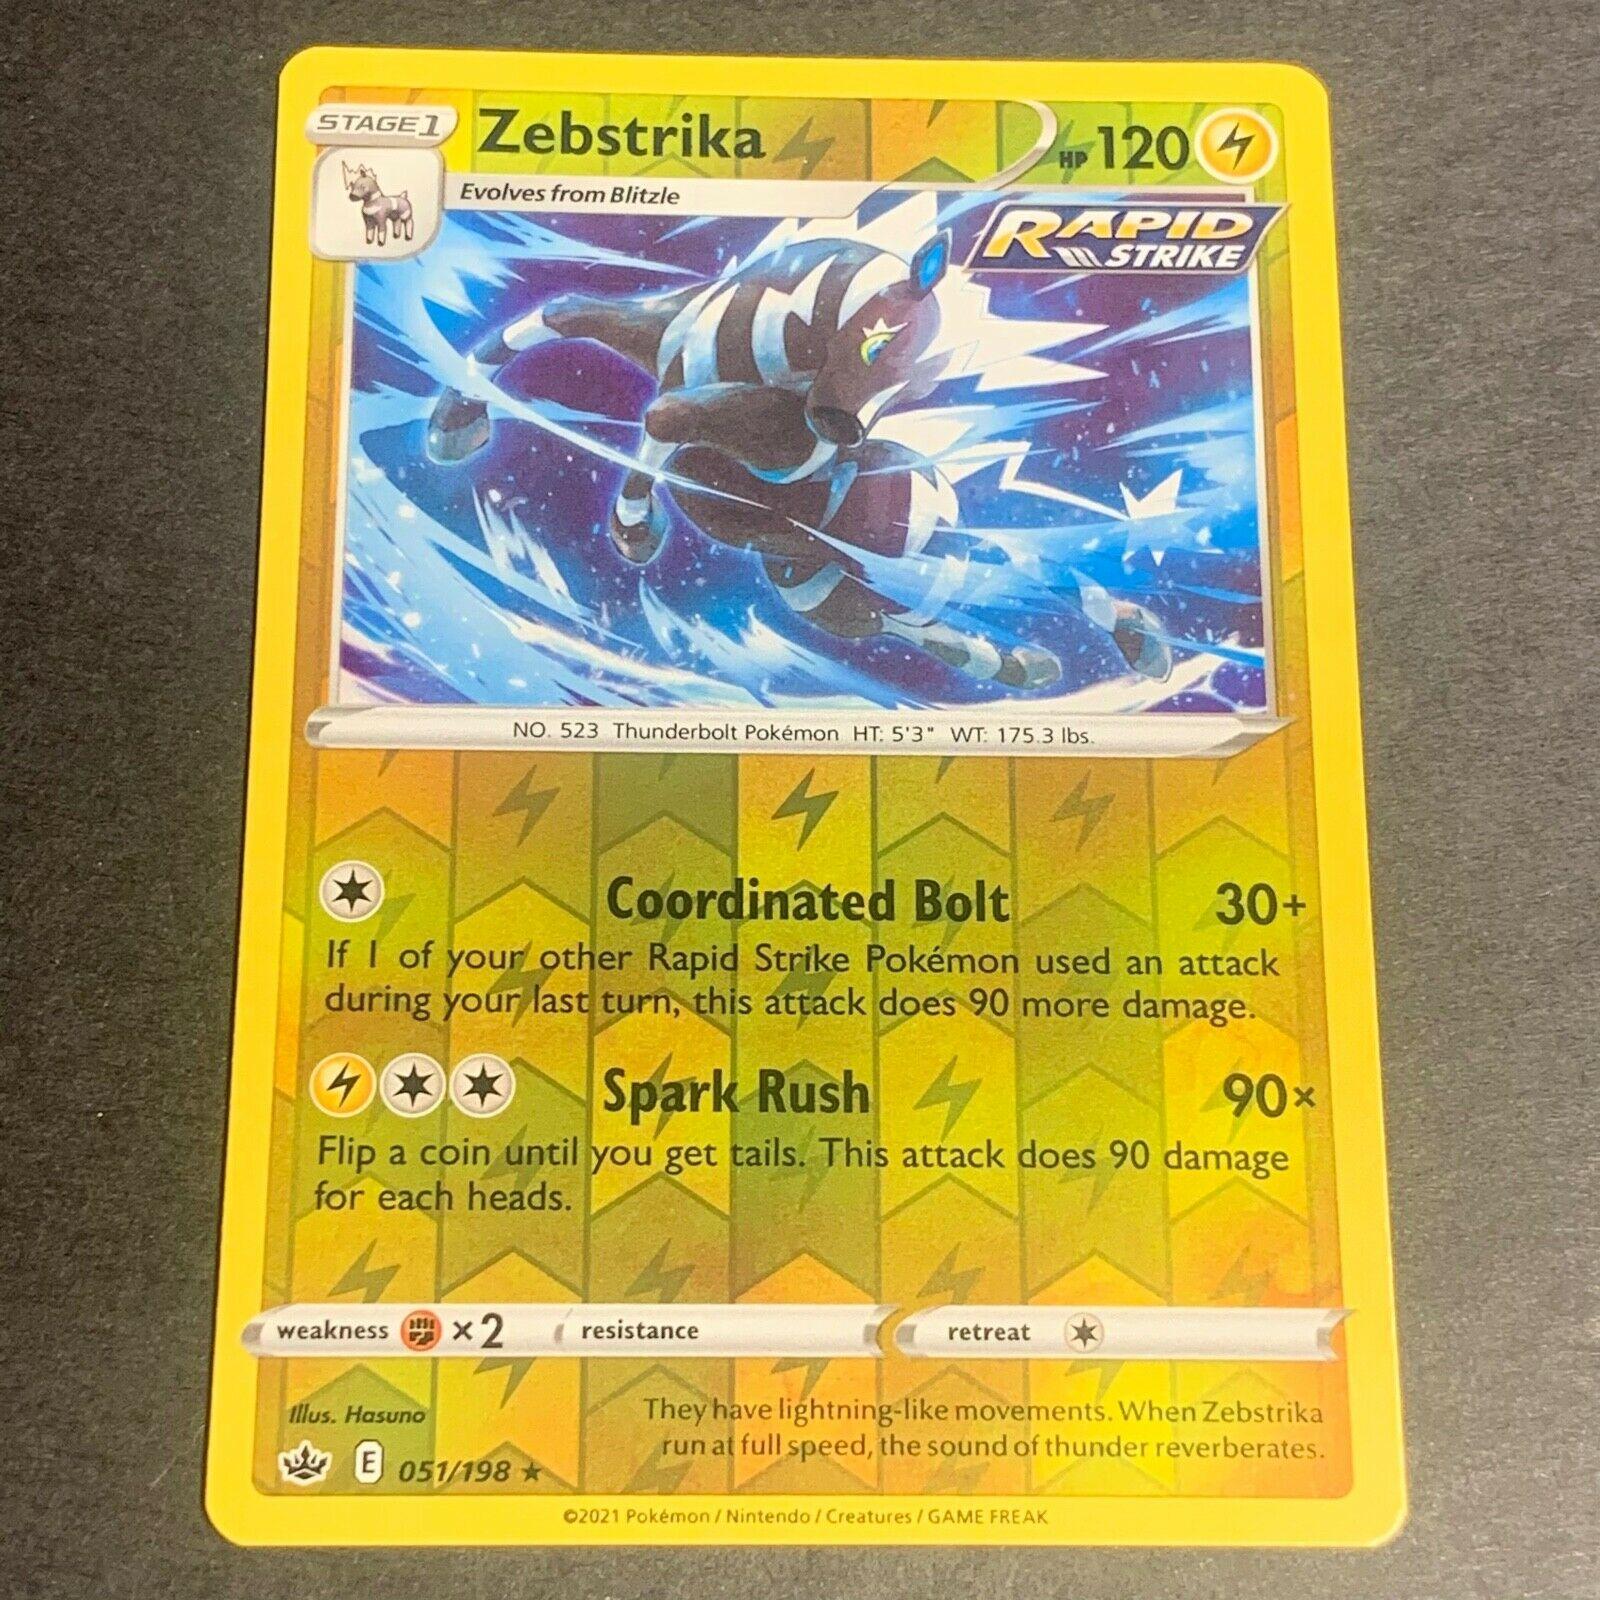 Pokemon S&S Chilling Reign REVERSE HOLO (R.) Zebstrika 051/198 - Near Mint (NM)